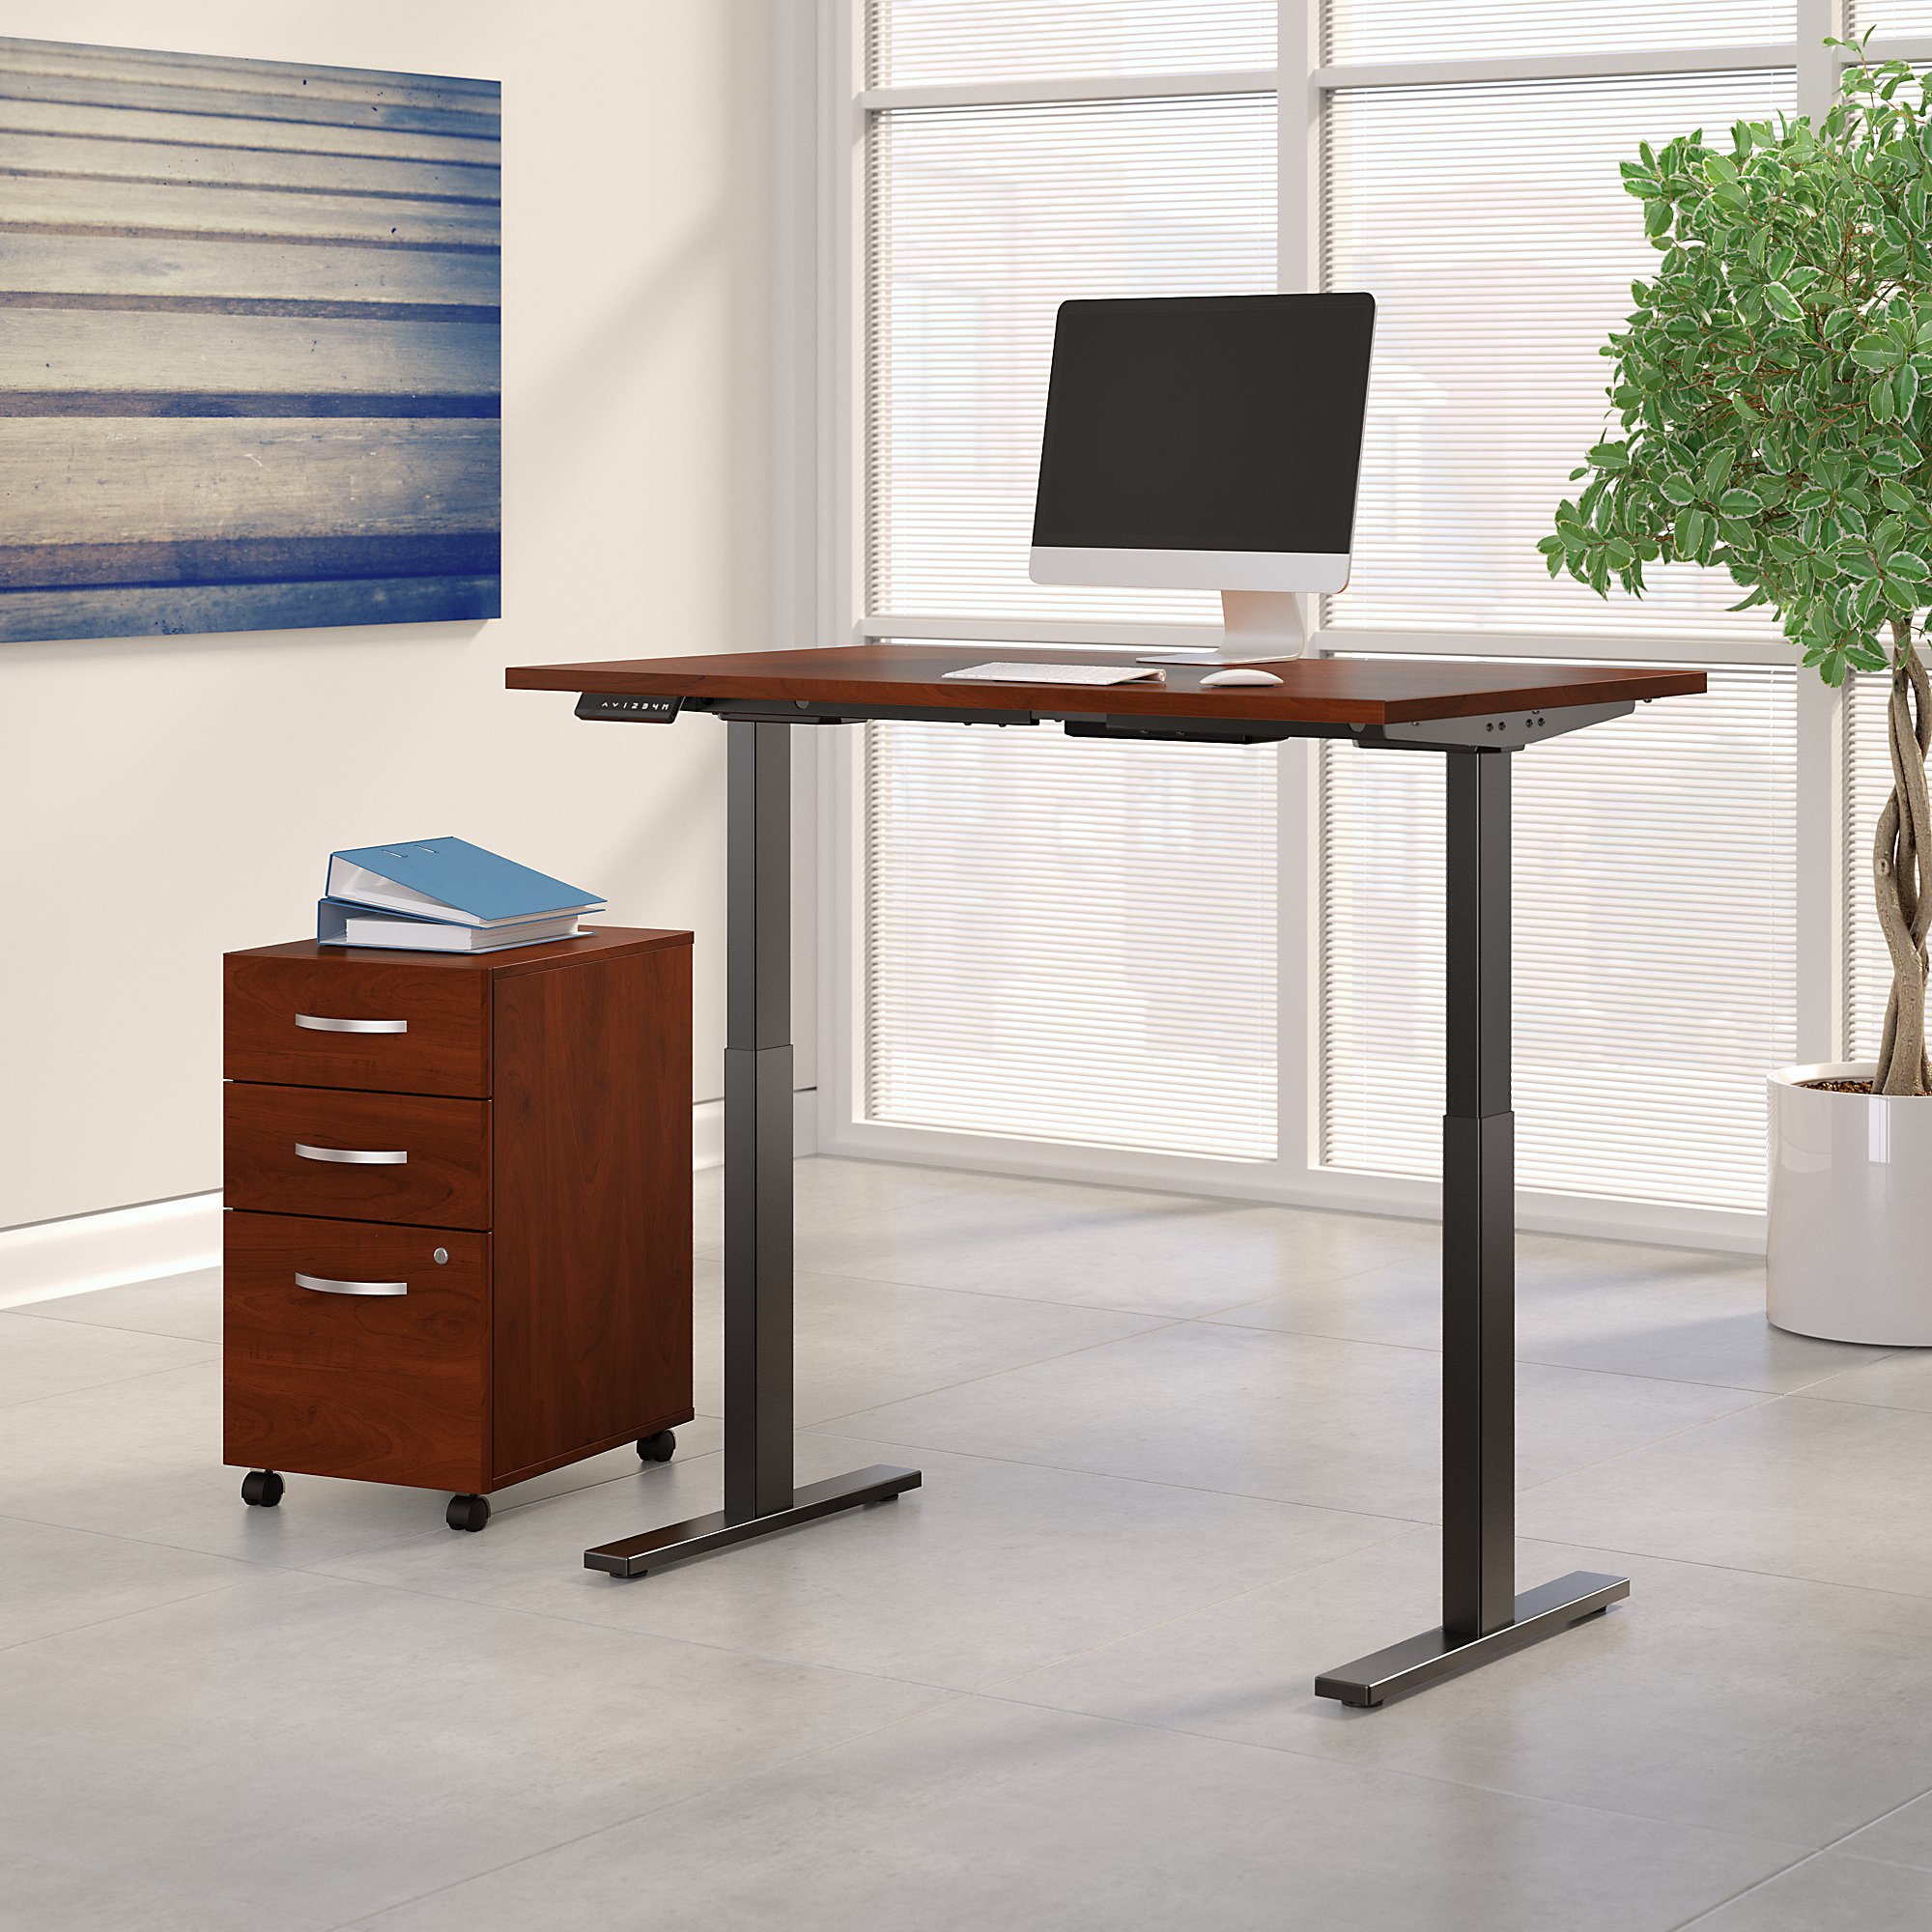 hansen cherry adjustable desk with file